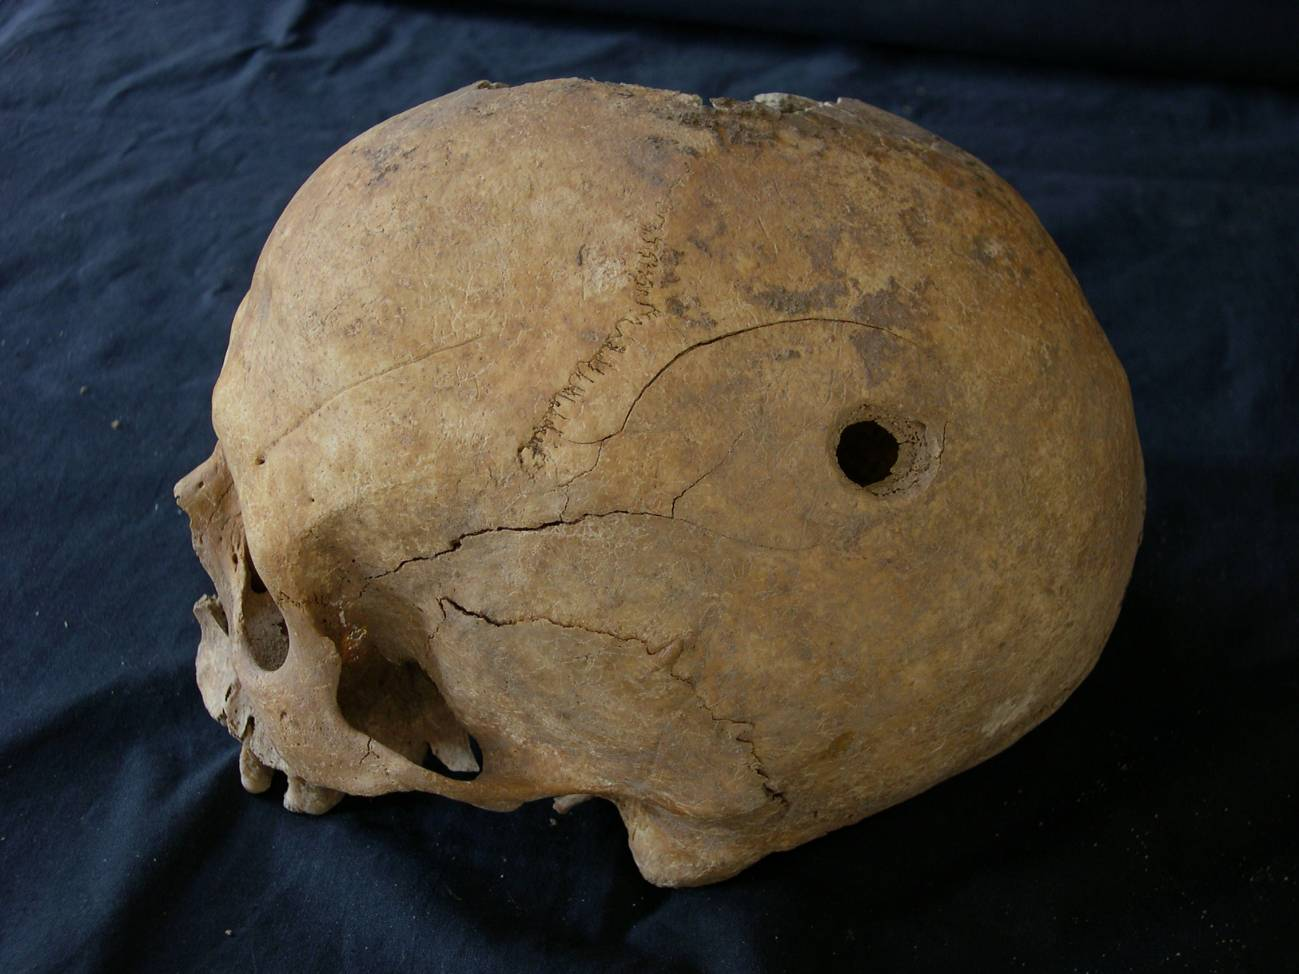 Cráneo trepanado. Imagen: Esther Gómez López.